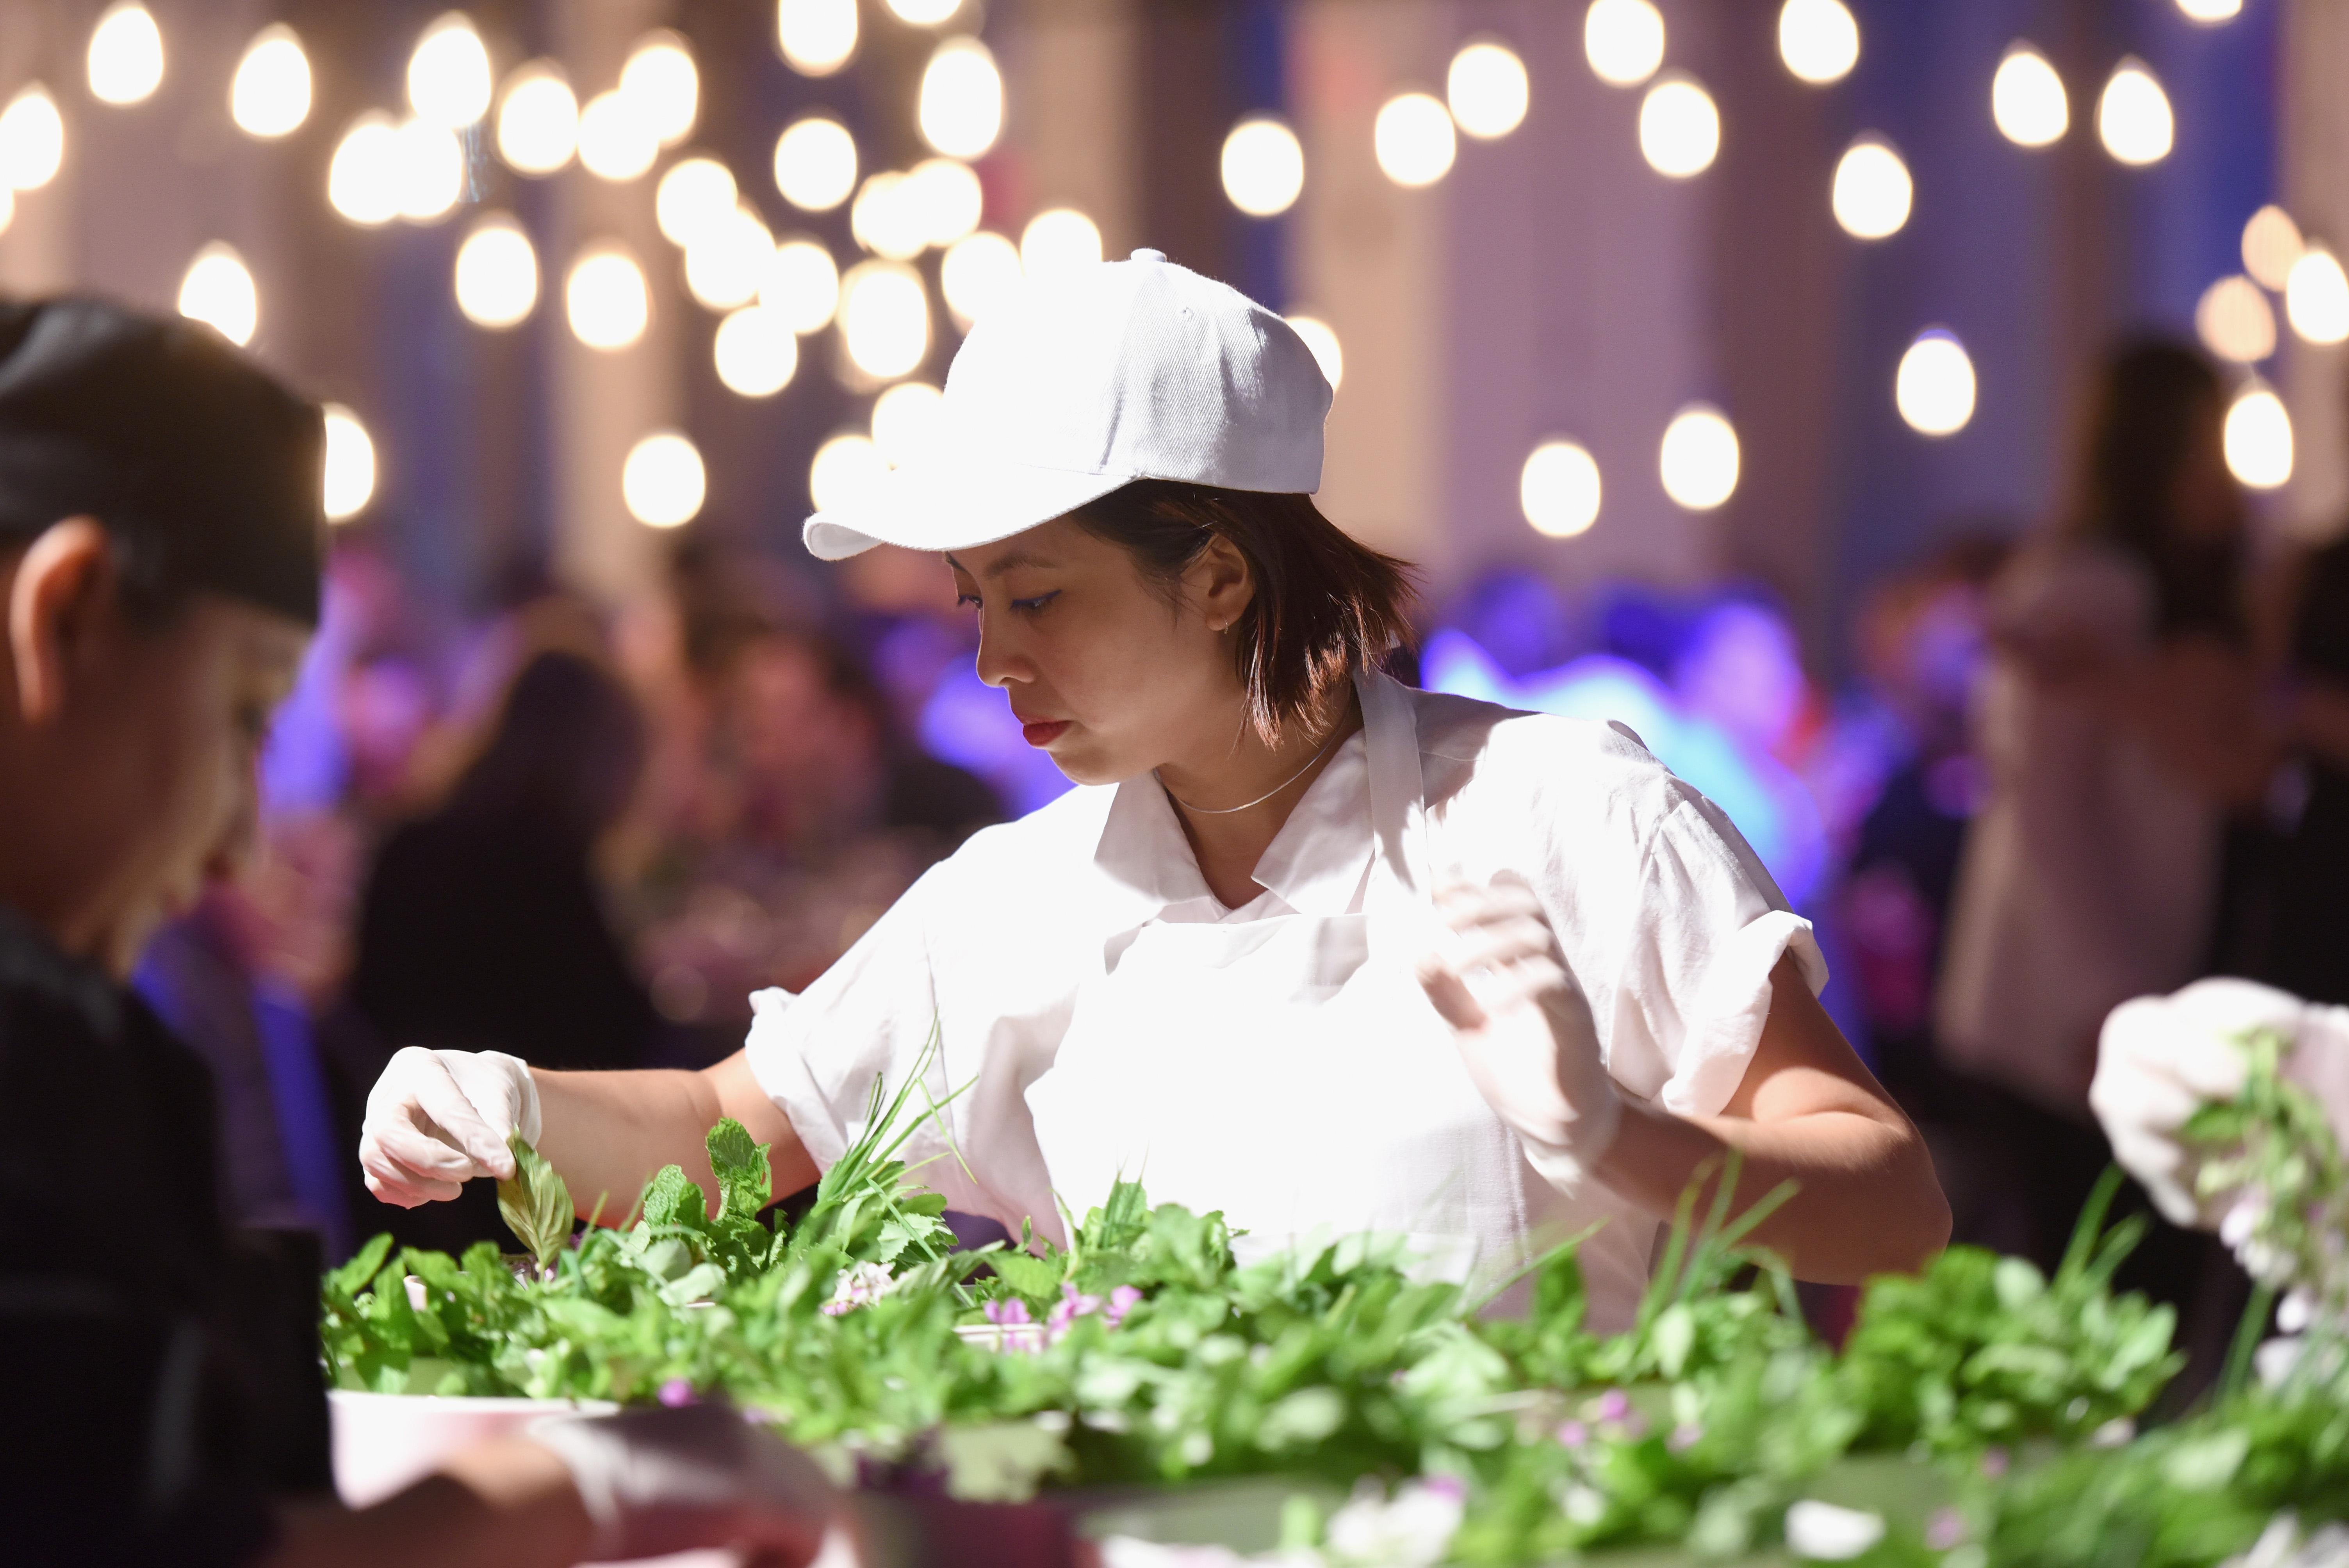 Chef Angela Dimayuga on June 2, 2016 in New York City.